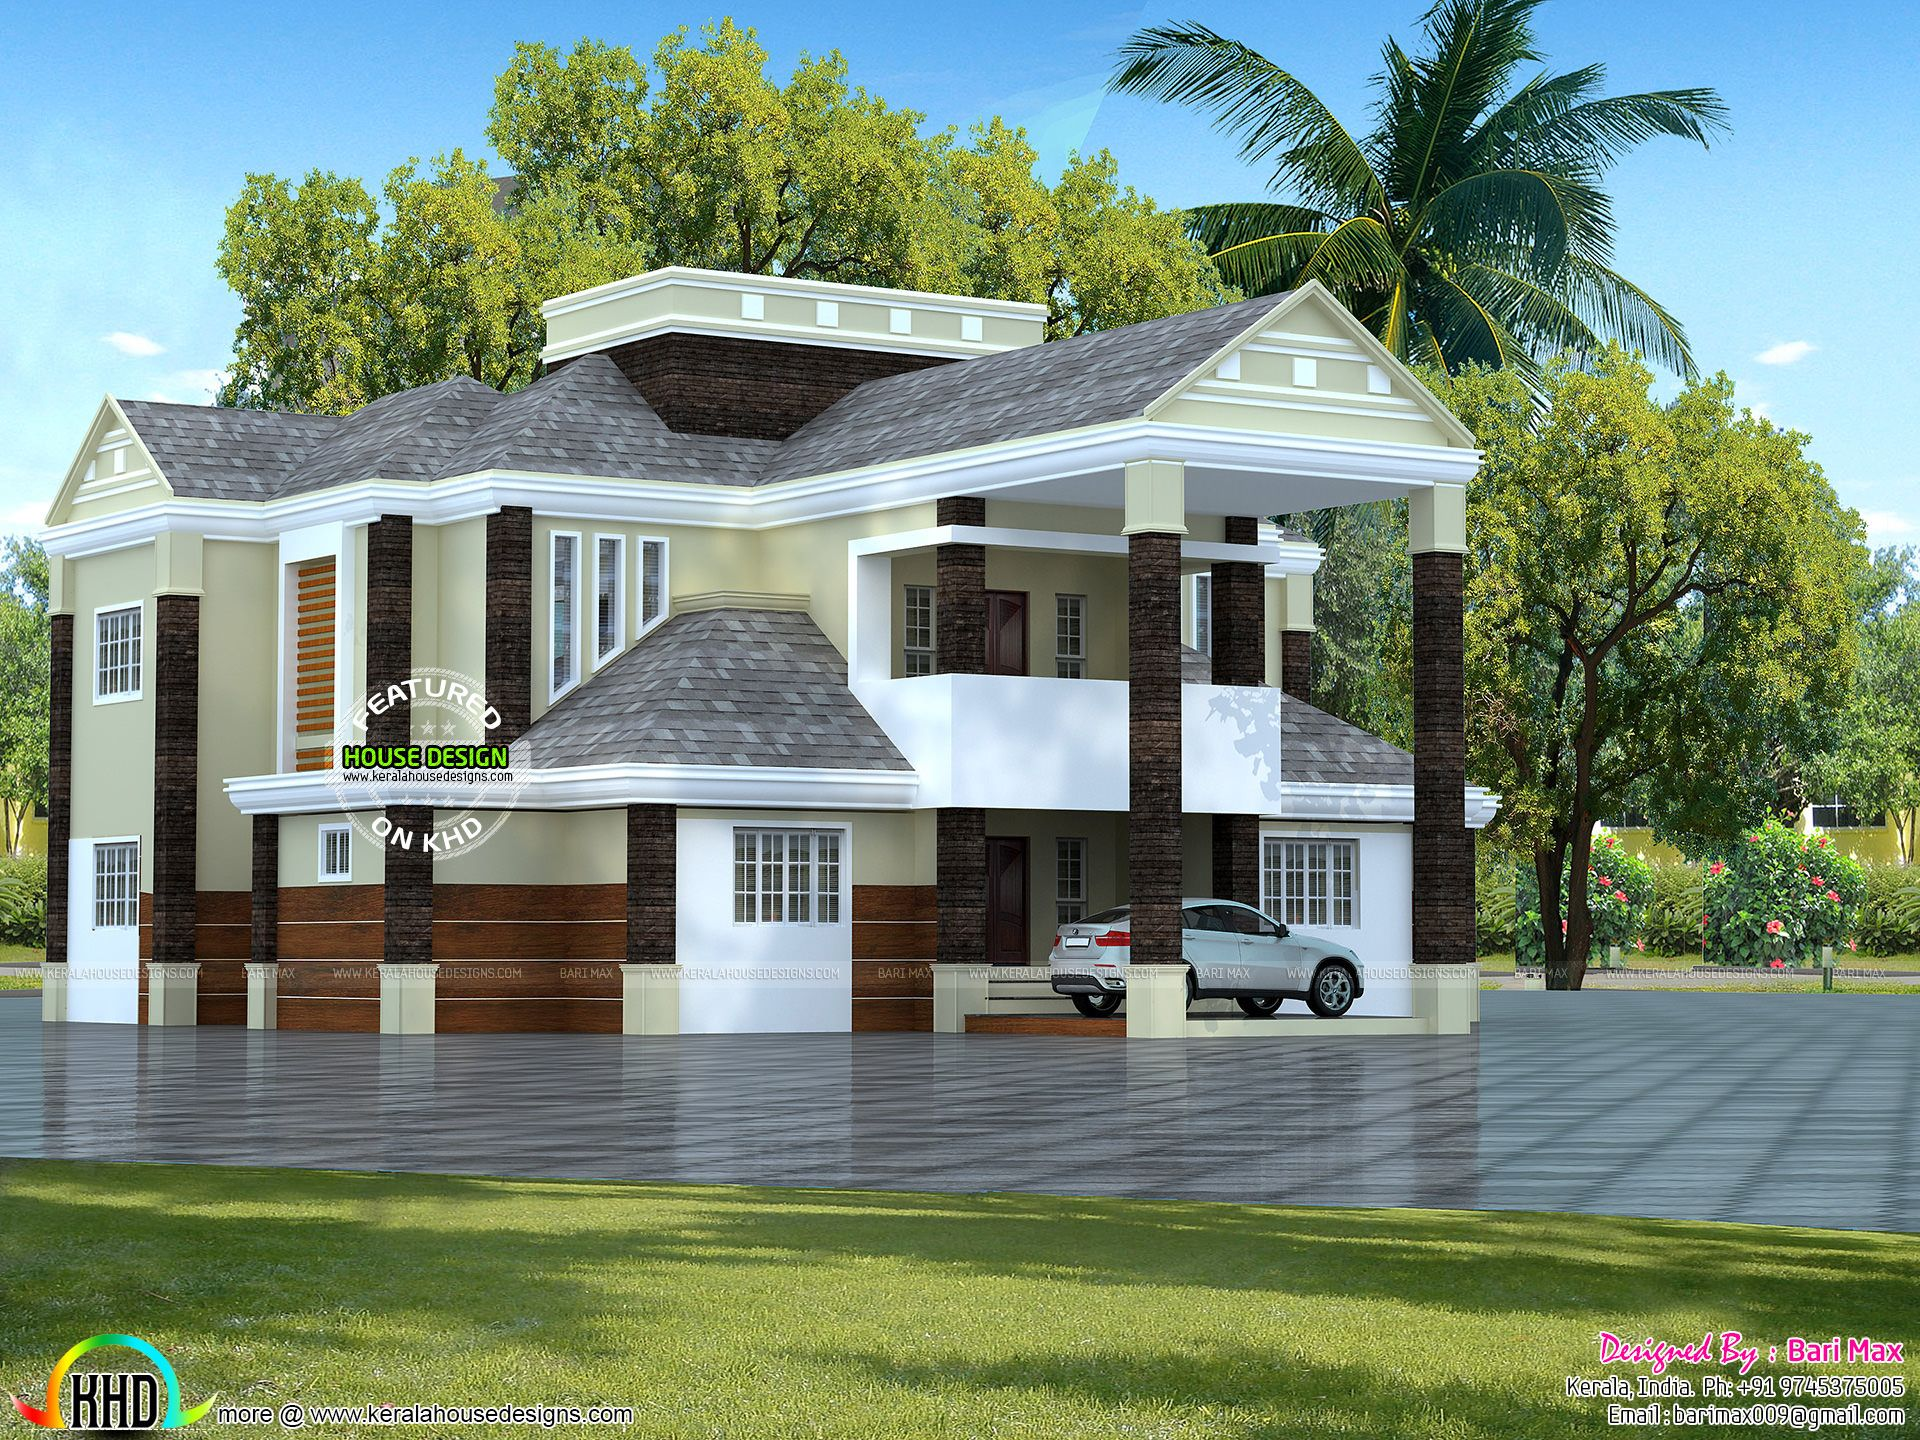 Colonial type 5 bedroom home in kerala kerala home for Colonial style homes in kerala